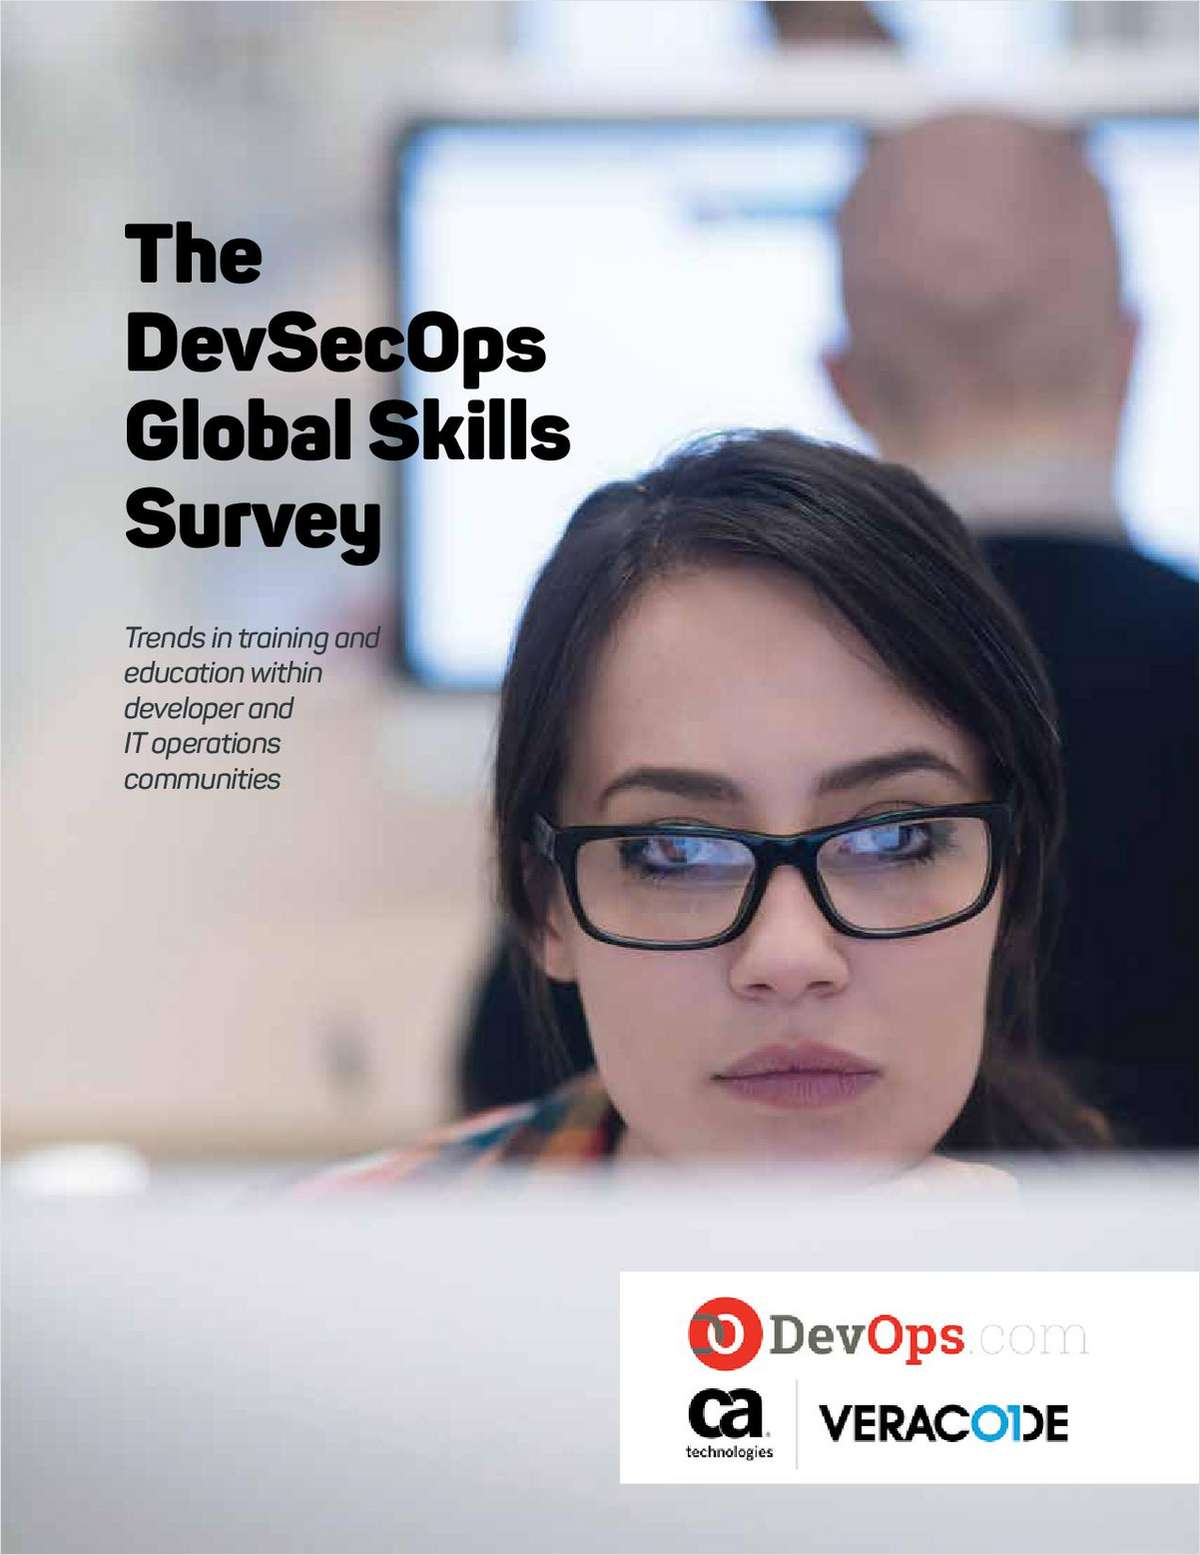 The DevSecOps Global Skills Survey